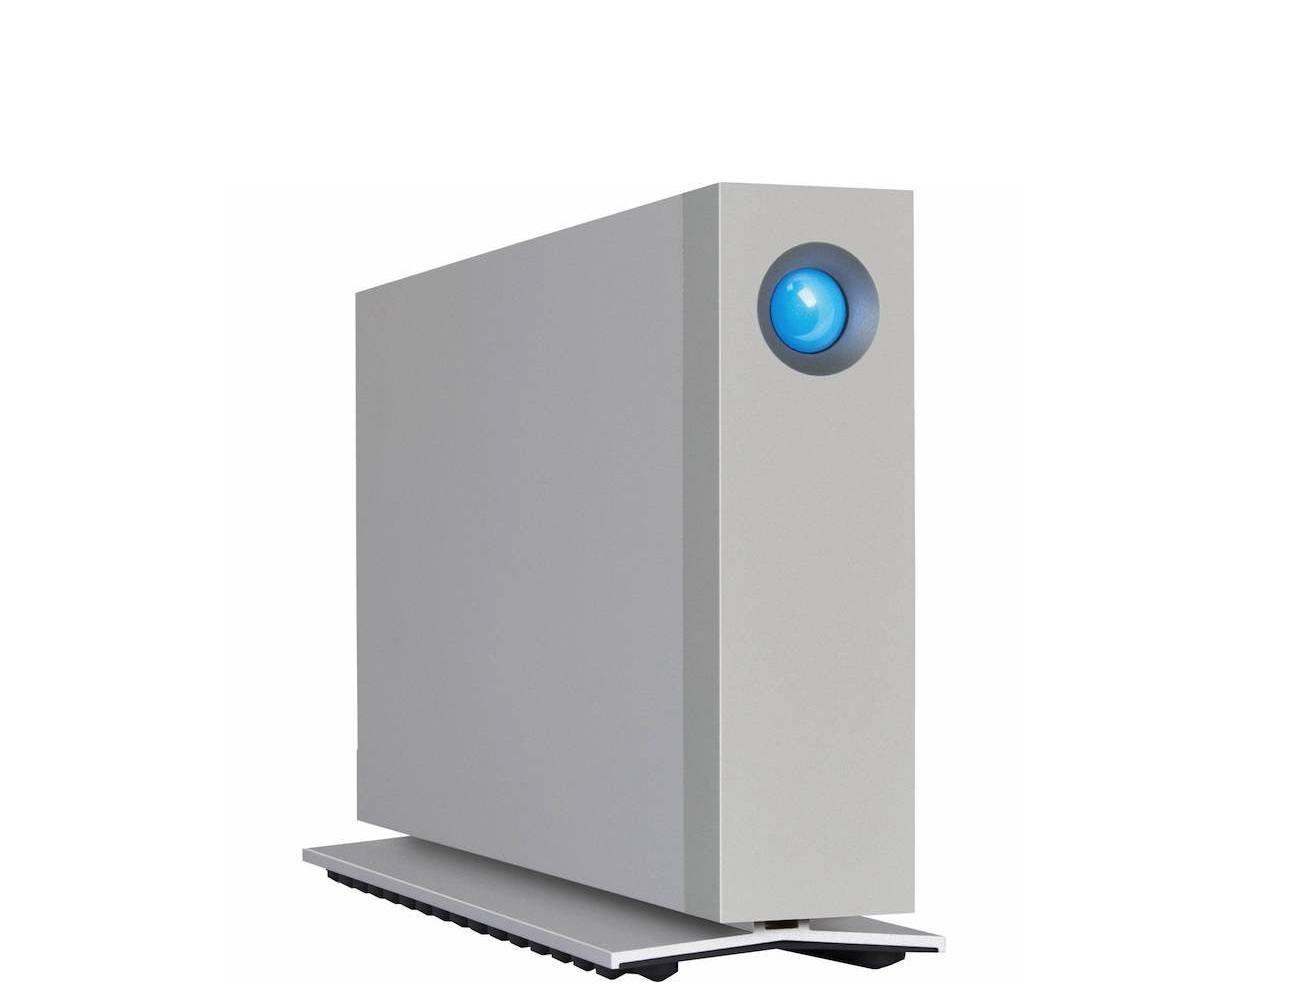 LaCie d2 Thunderbolt 3 Desktop Hard Drive